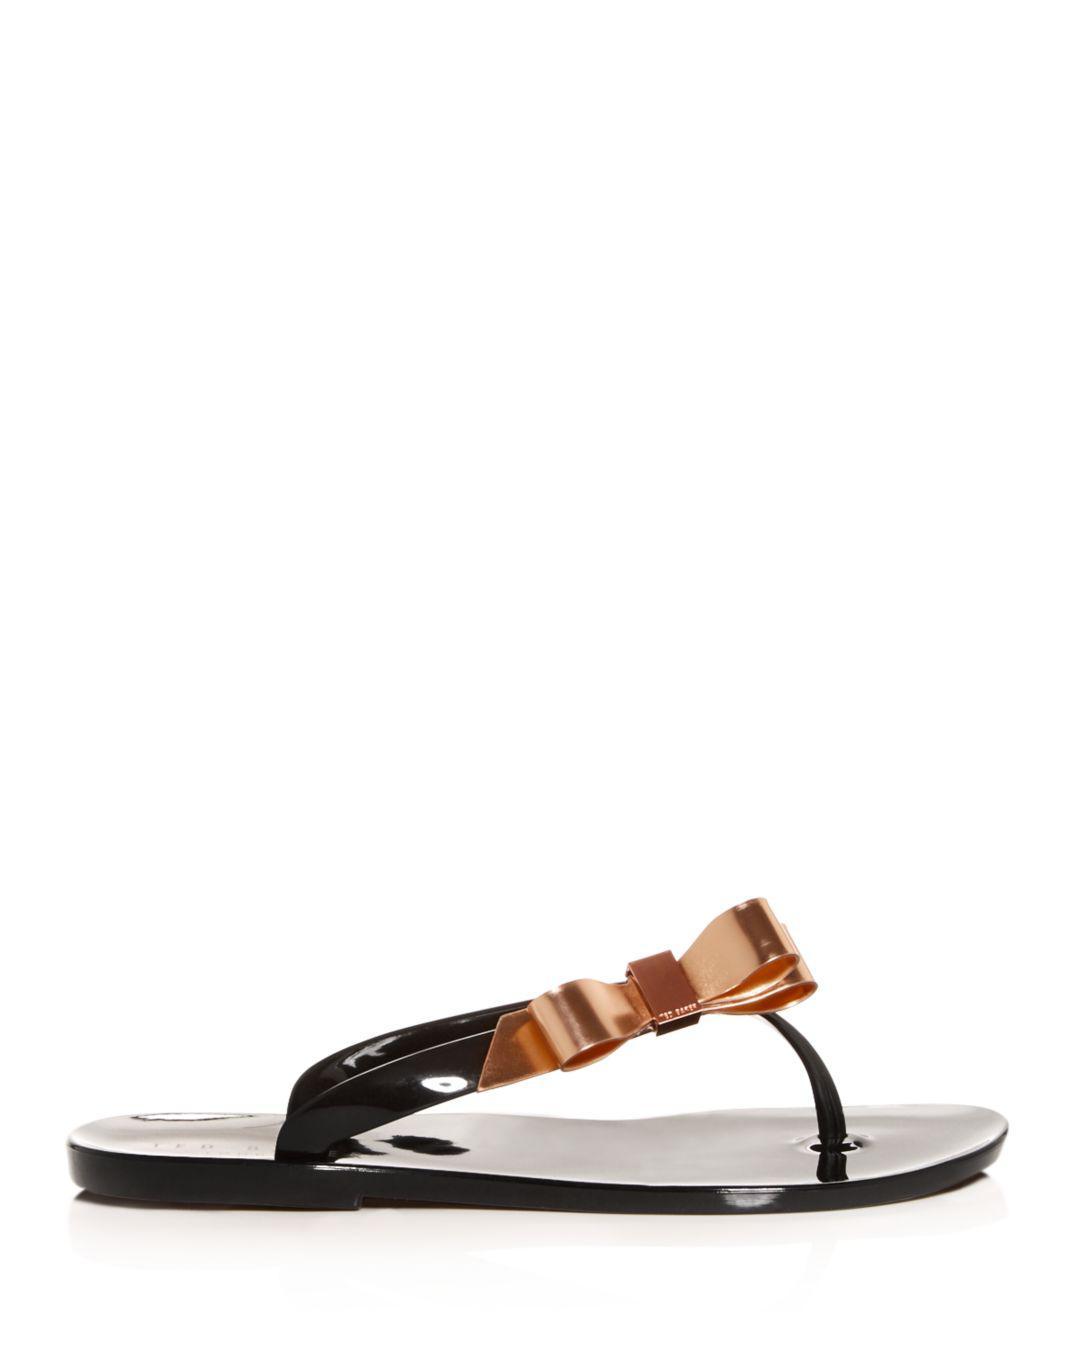 ad07014b1 Lyst - Ted Baker Women s Suszie Flip-flops